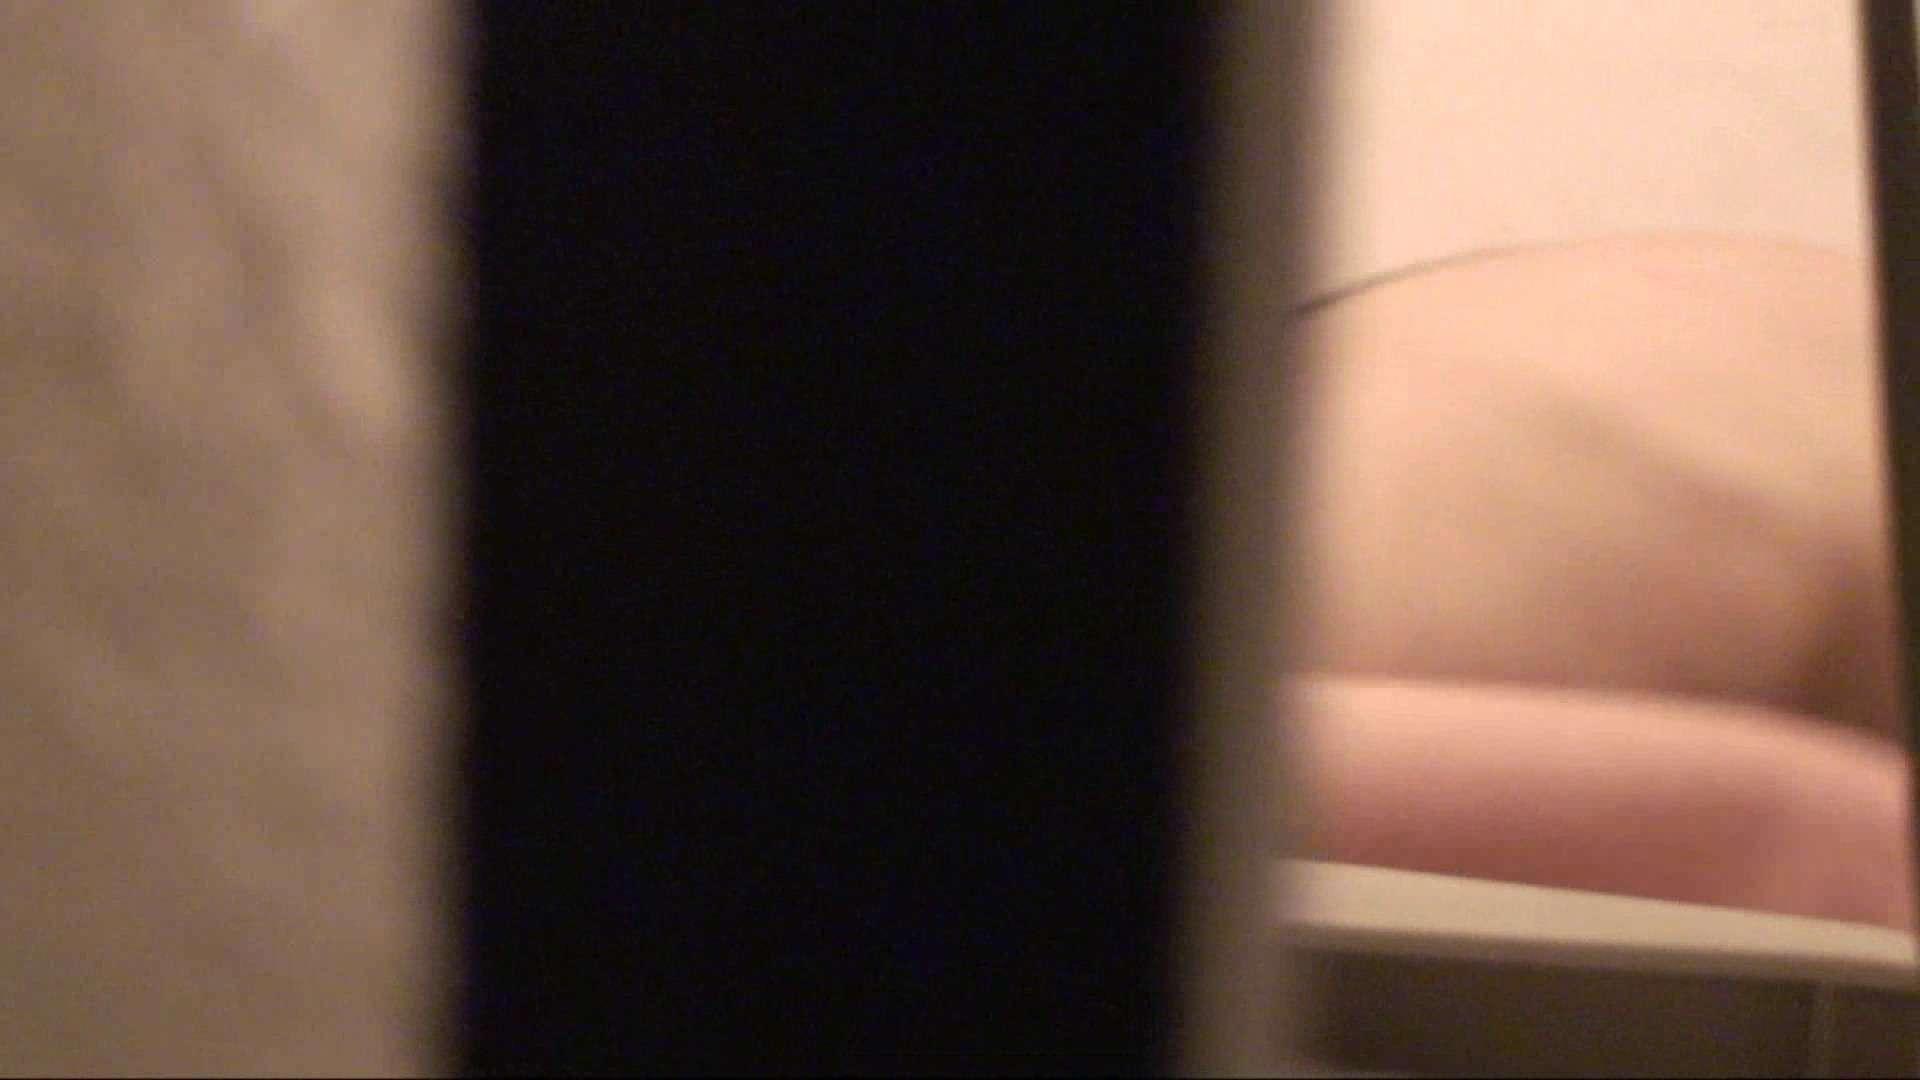 vol.01必見!白肌嬢の乳首が丸見え。極上美人のすっぴん顔をハイビジョンで! 美人 エロ無料画像 89pic 75